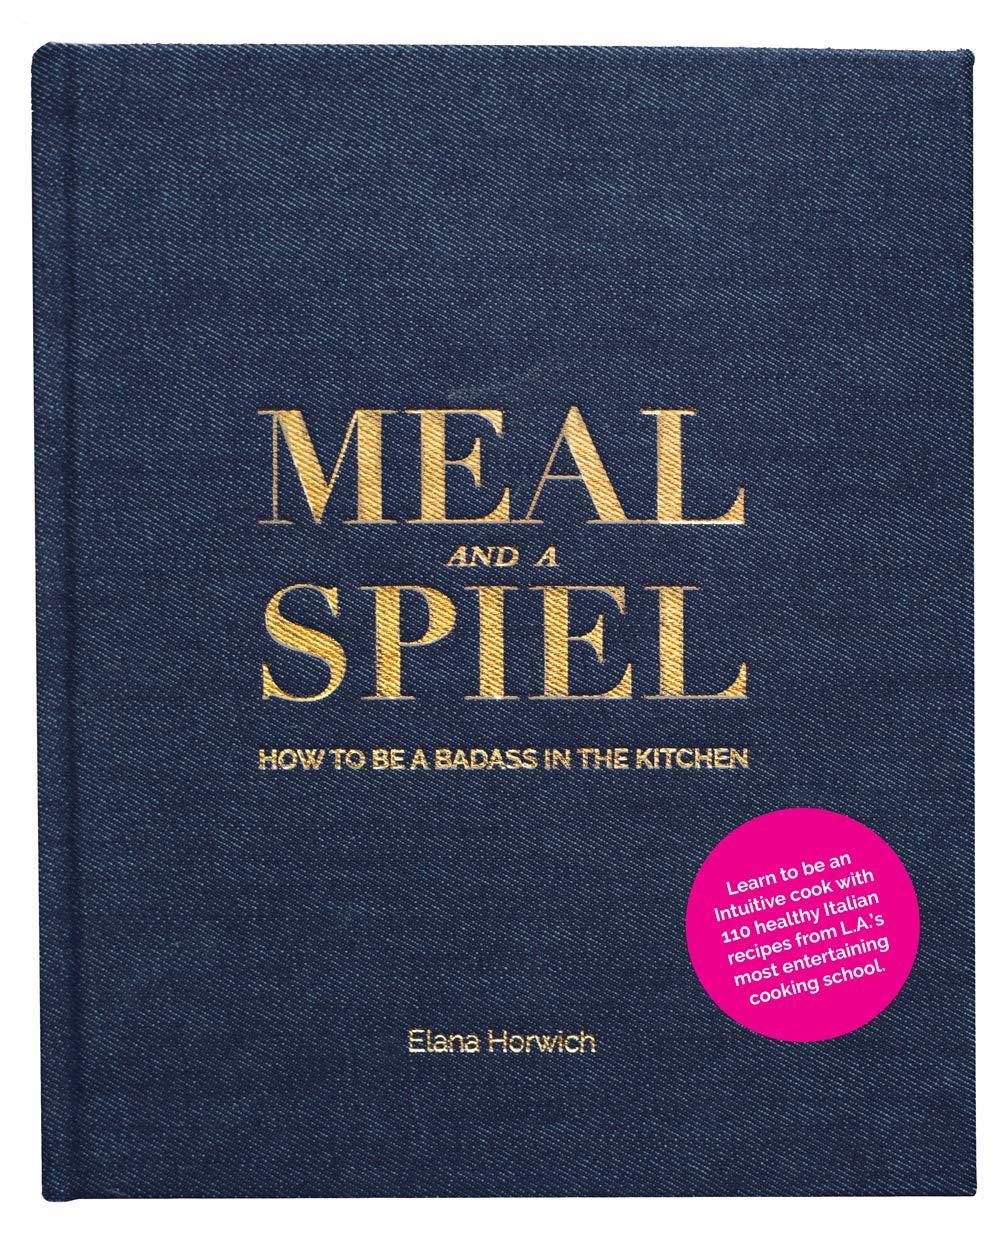 Meal And A Spiel How To Be A Badass In The Kitchen Amazon De Grossman Seth Horwich Elana Schell John Fremdsprachige Bucher